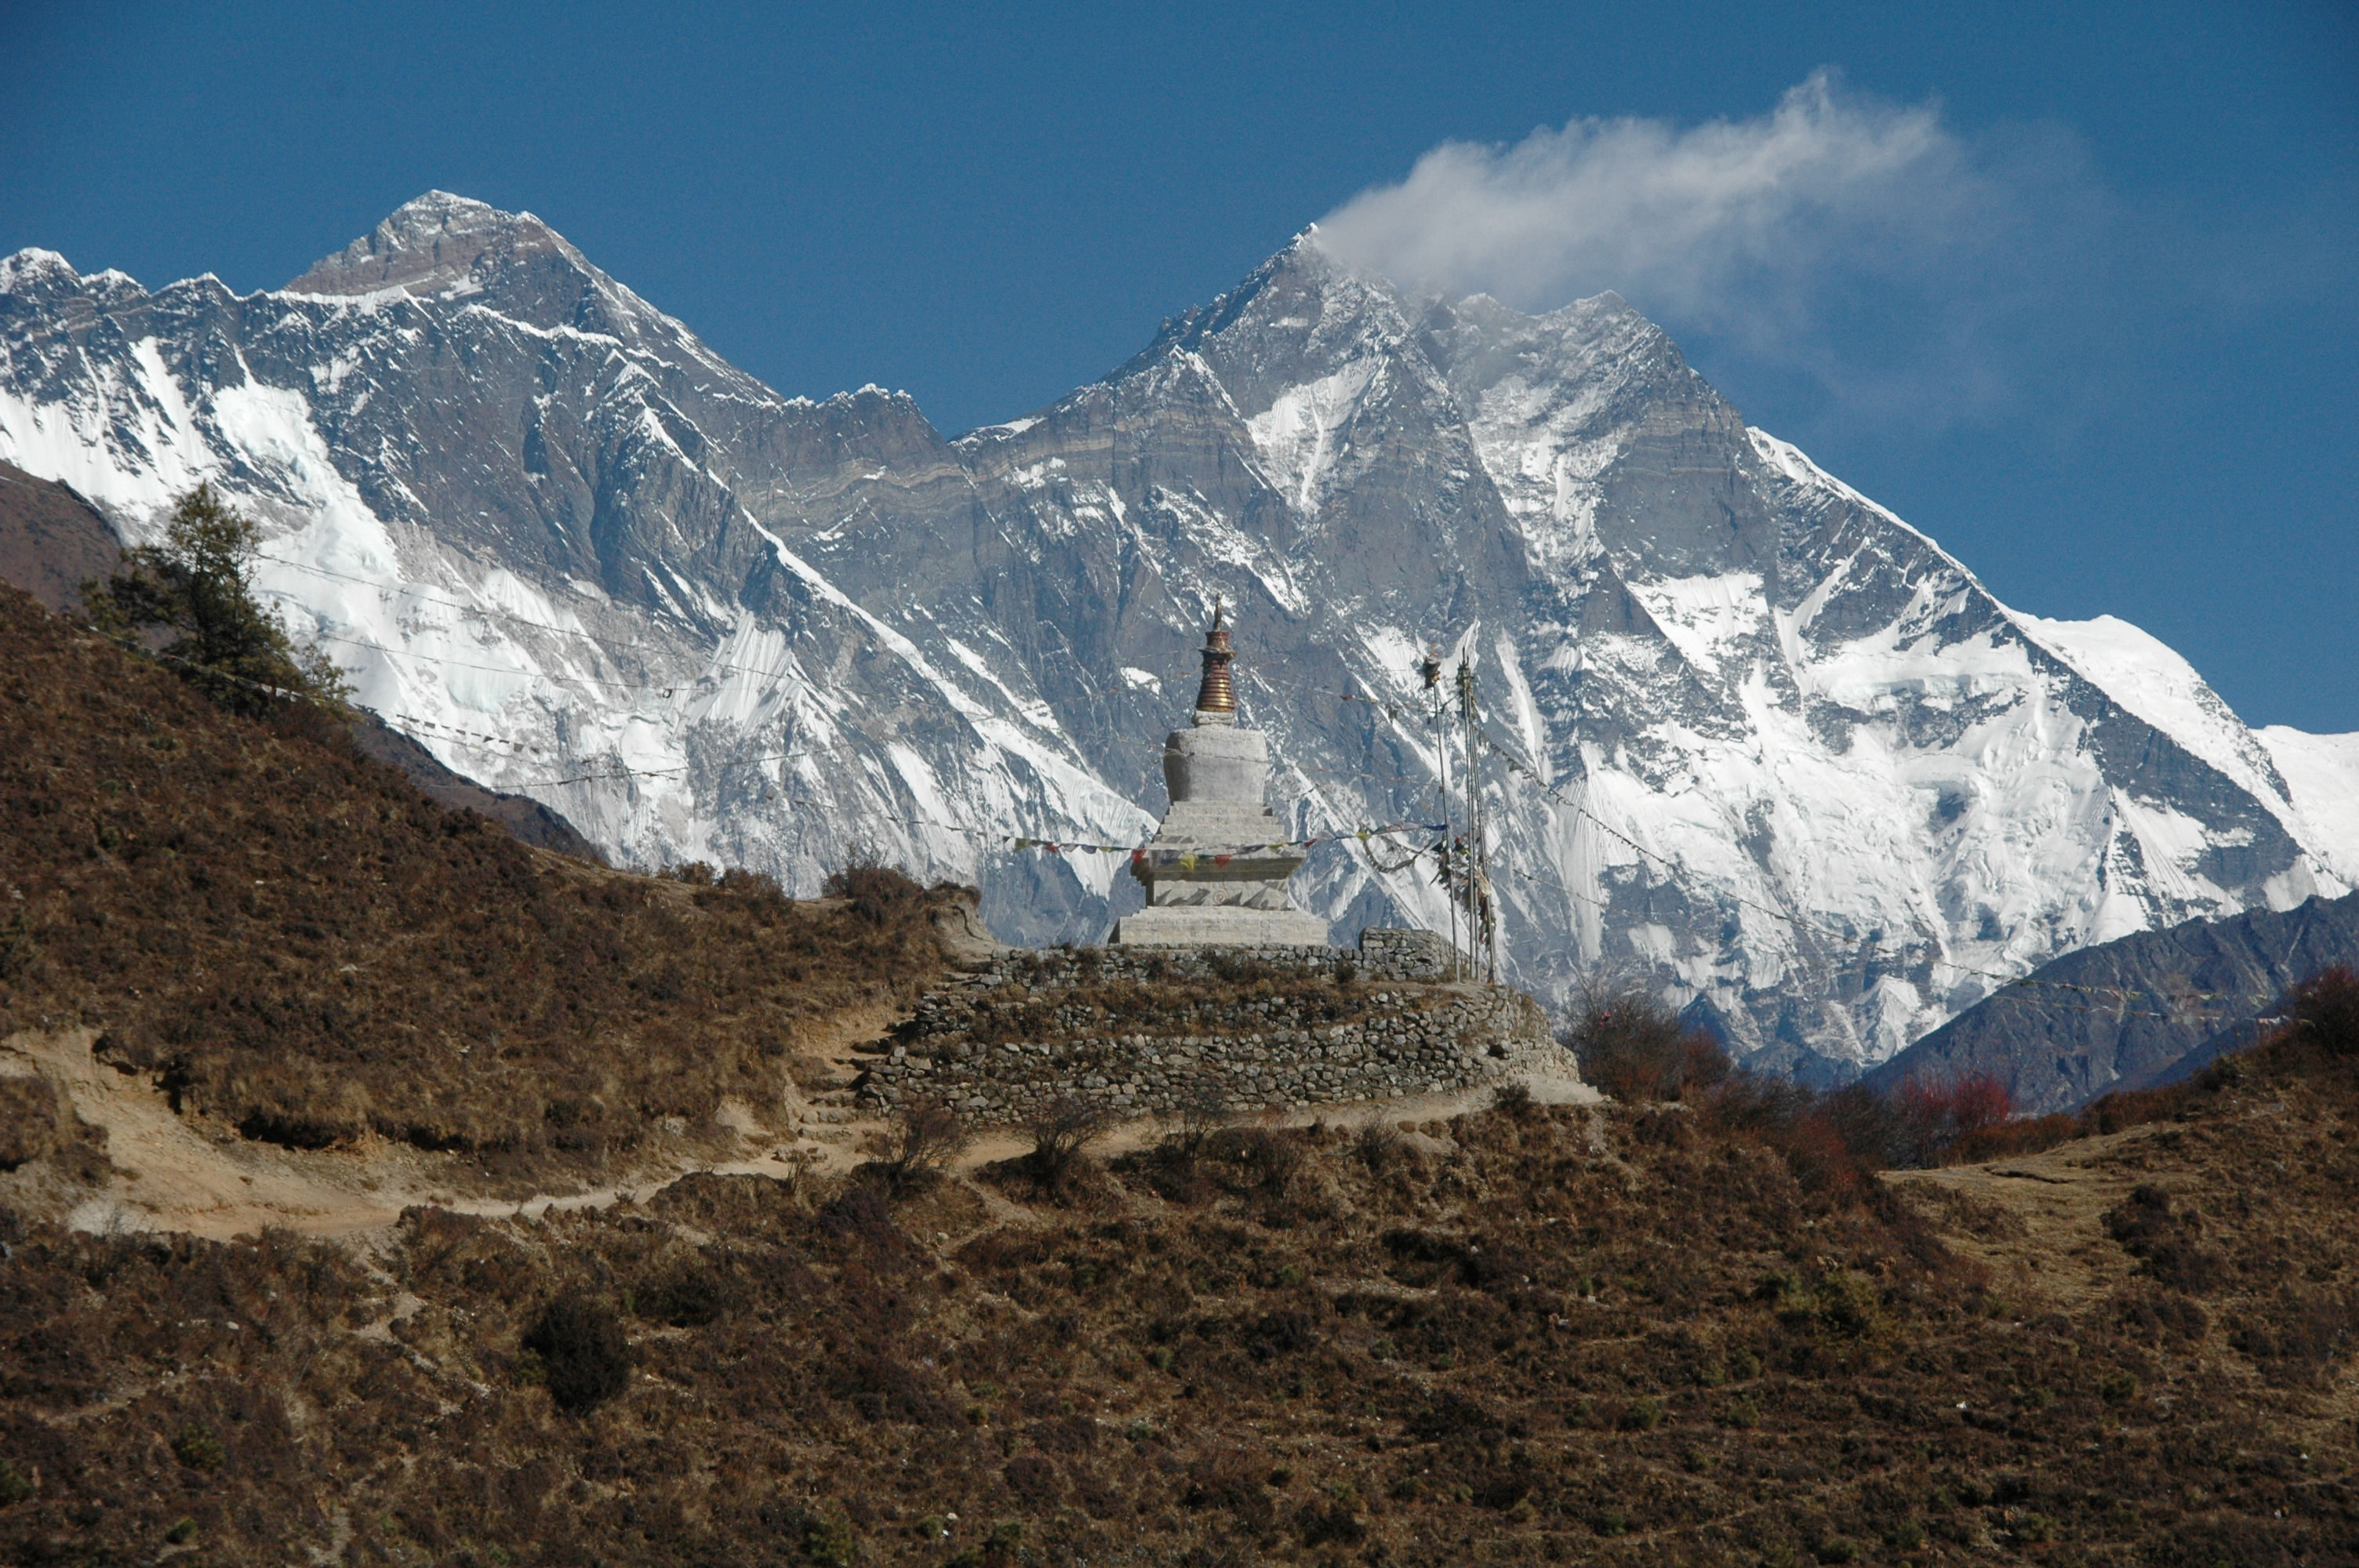 Mount Everest (8848m/29029ft)